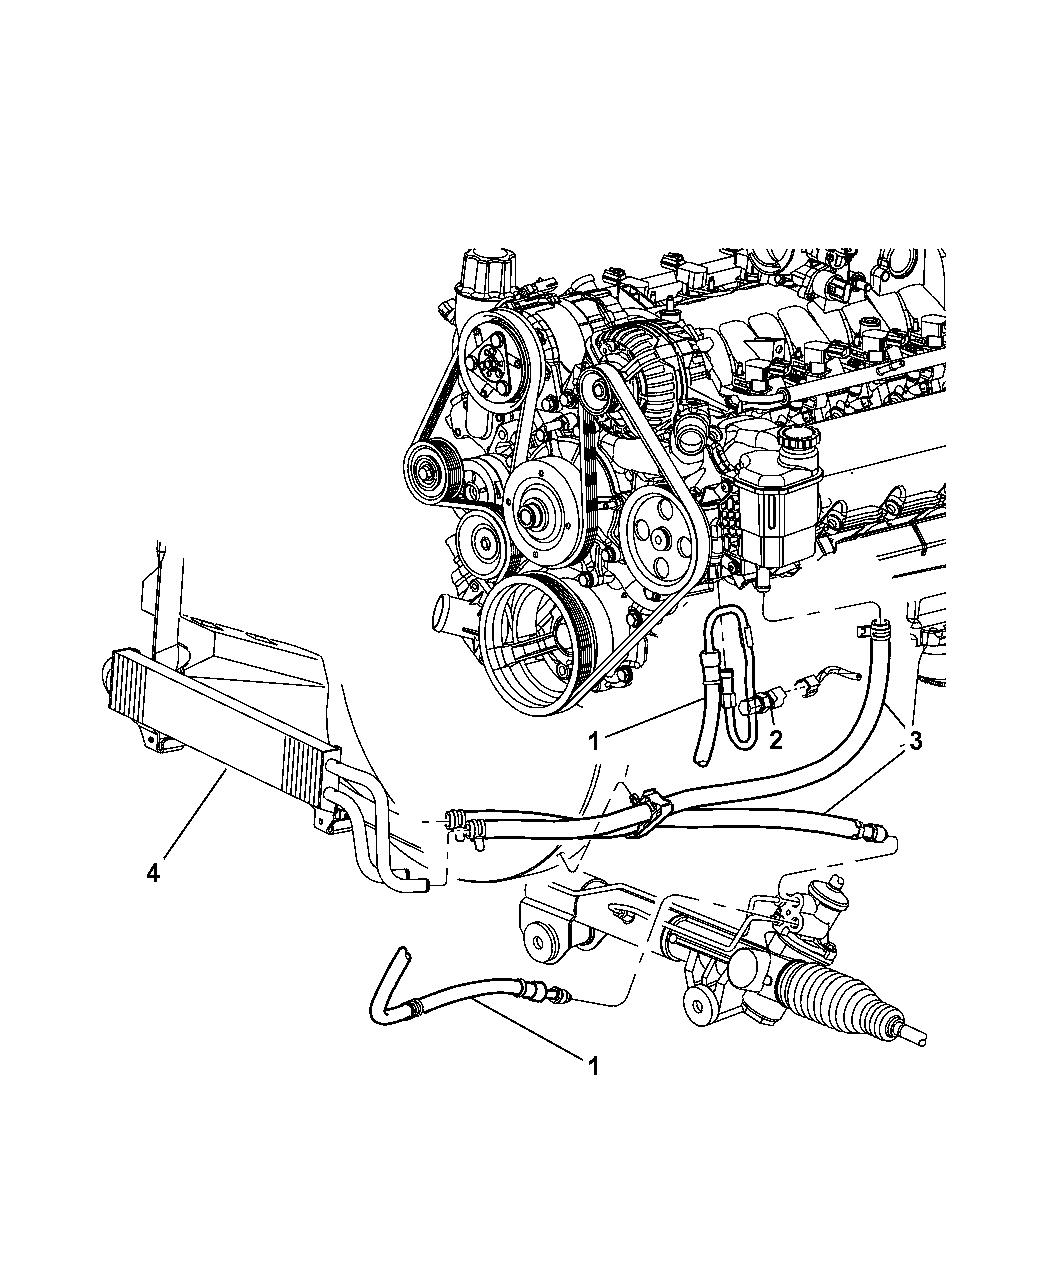 2002 Dodge Ram 1500 Power Steering Hoses - Mopar Parts Giant